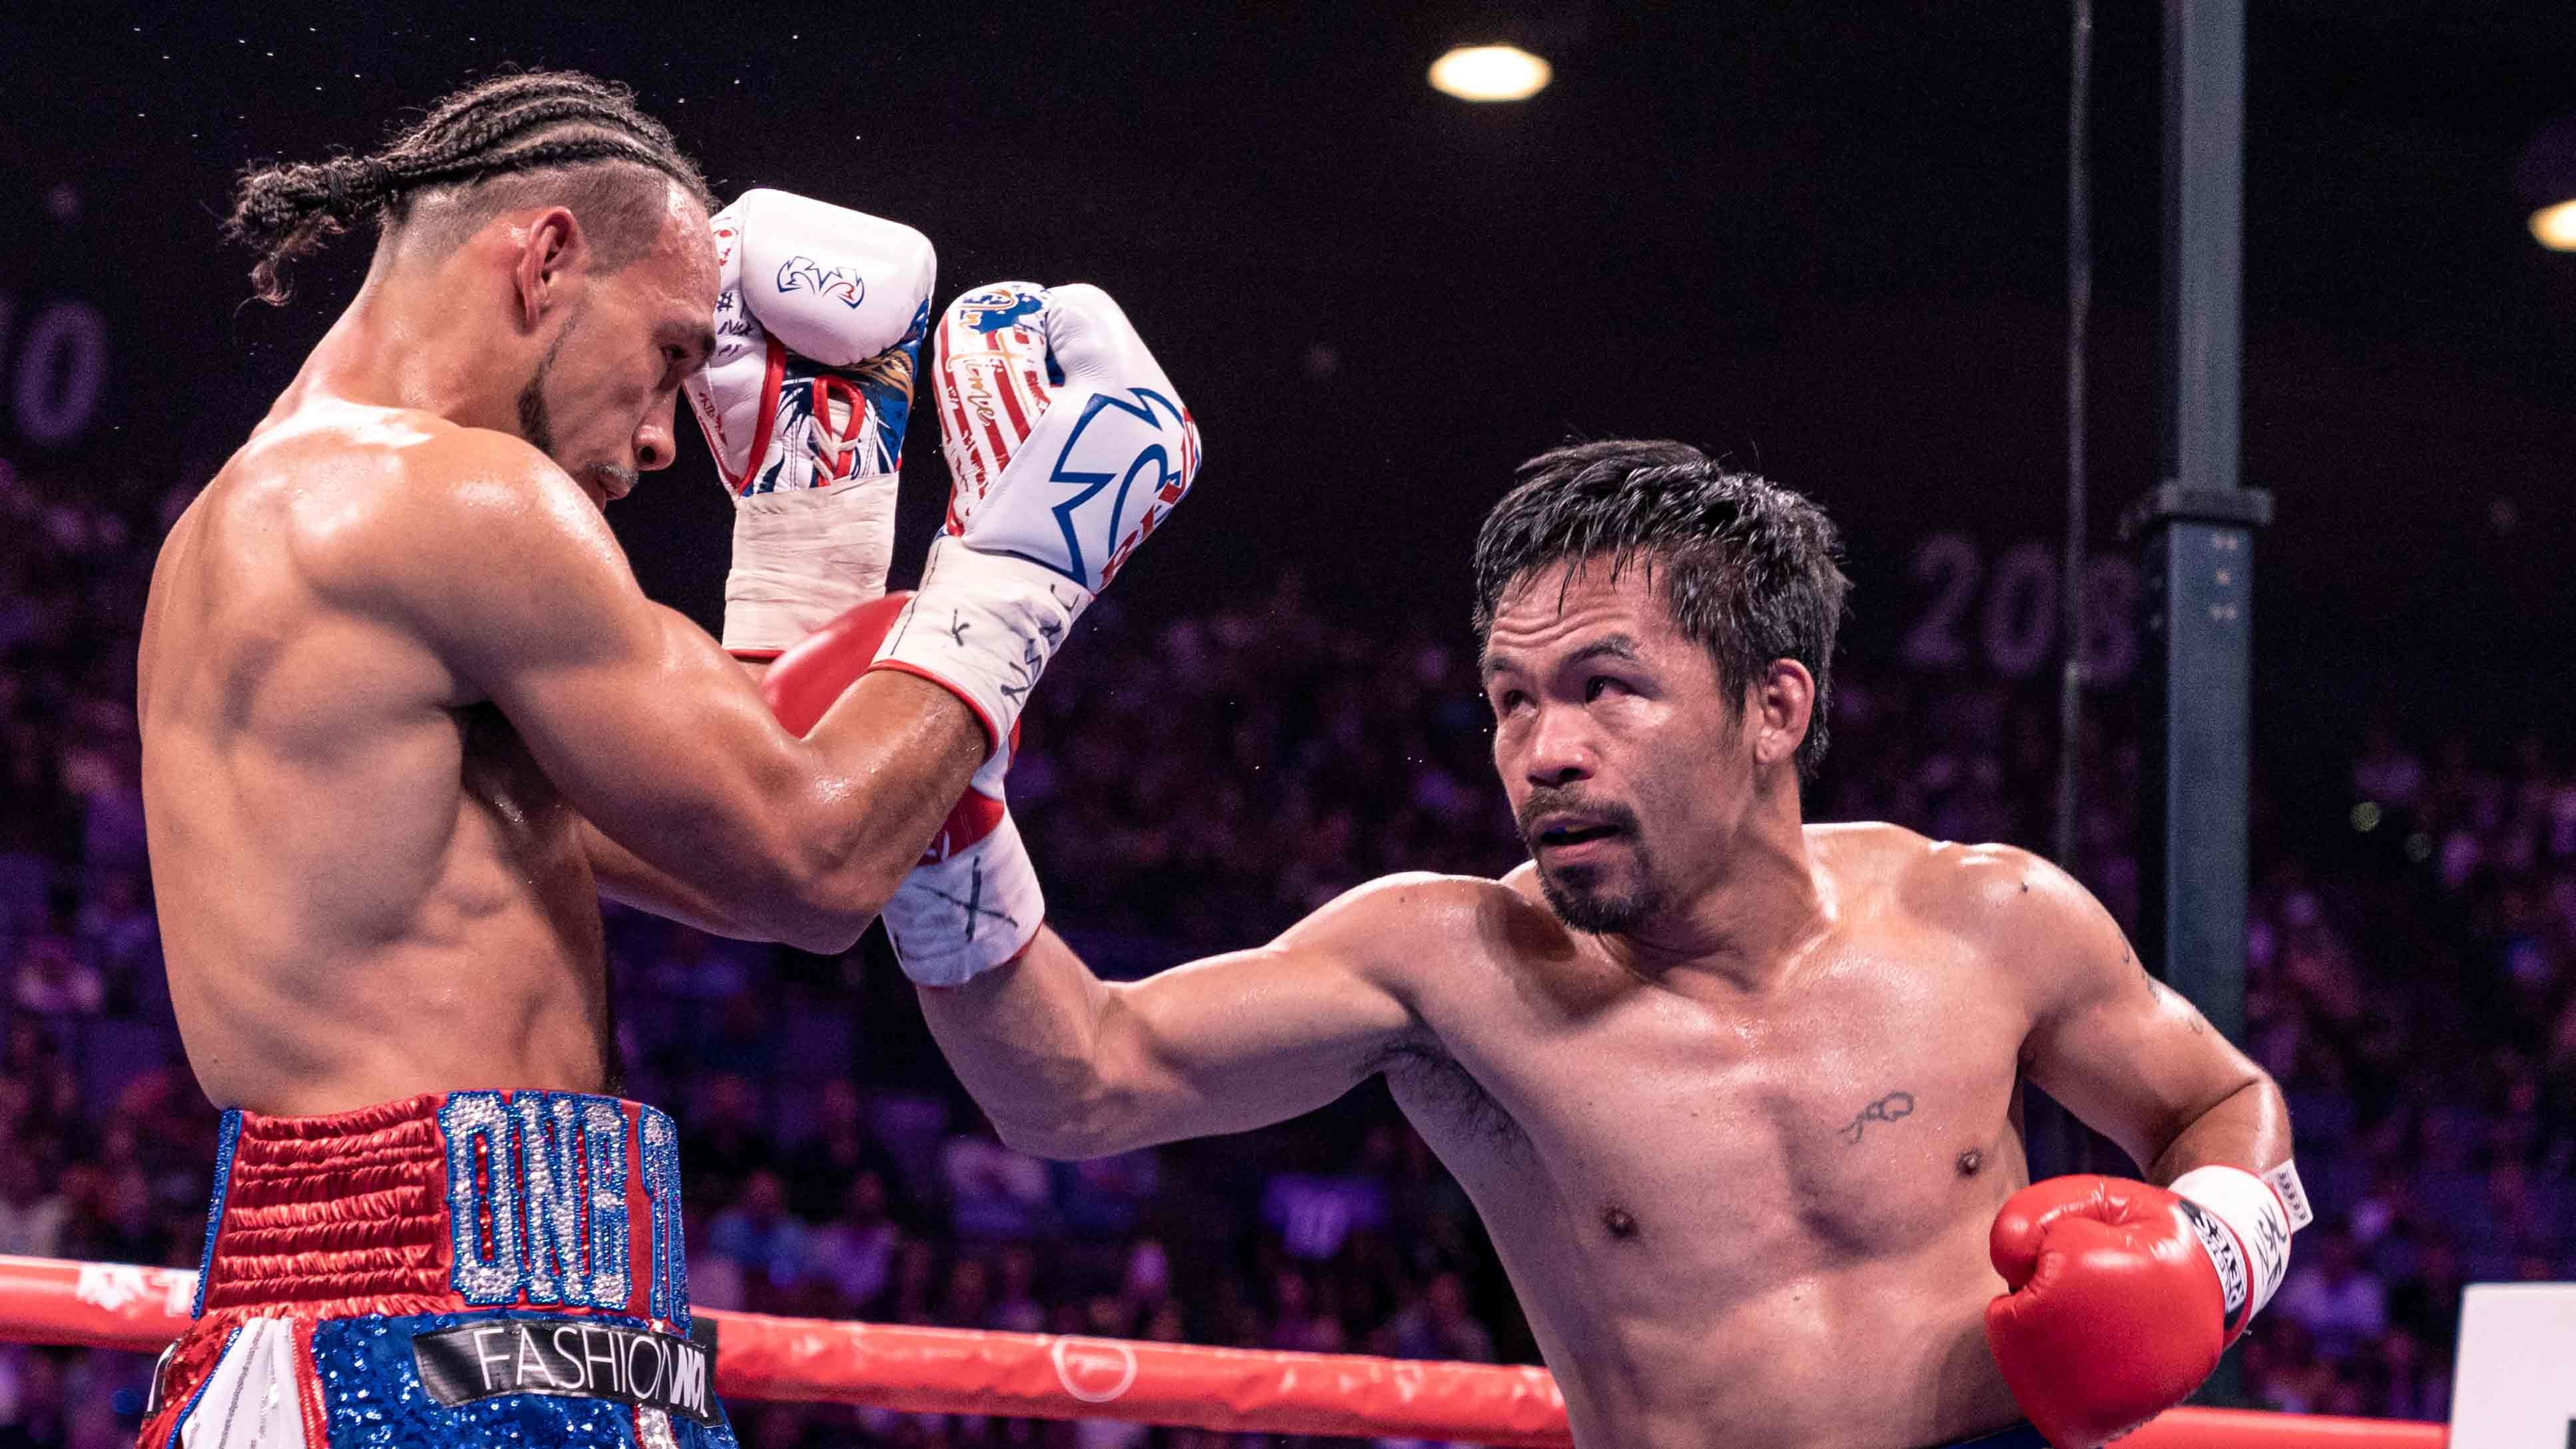 Manny Pacquiao - Next Fight, Fighter Bio, Stats & News